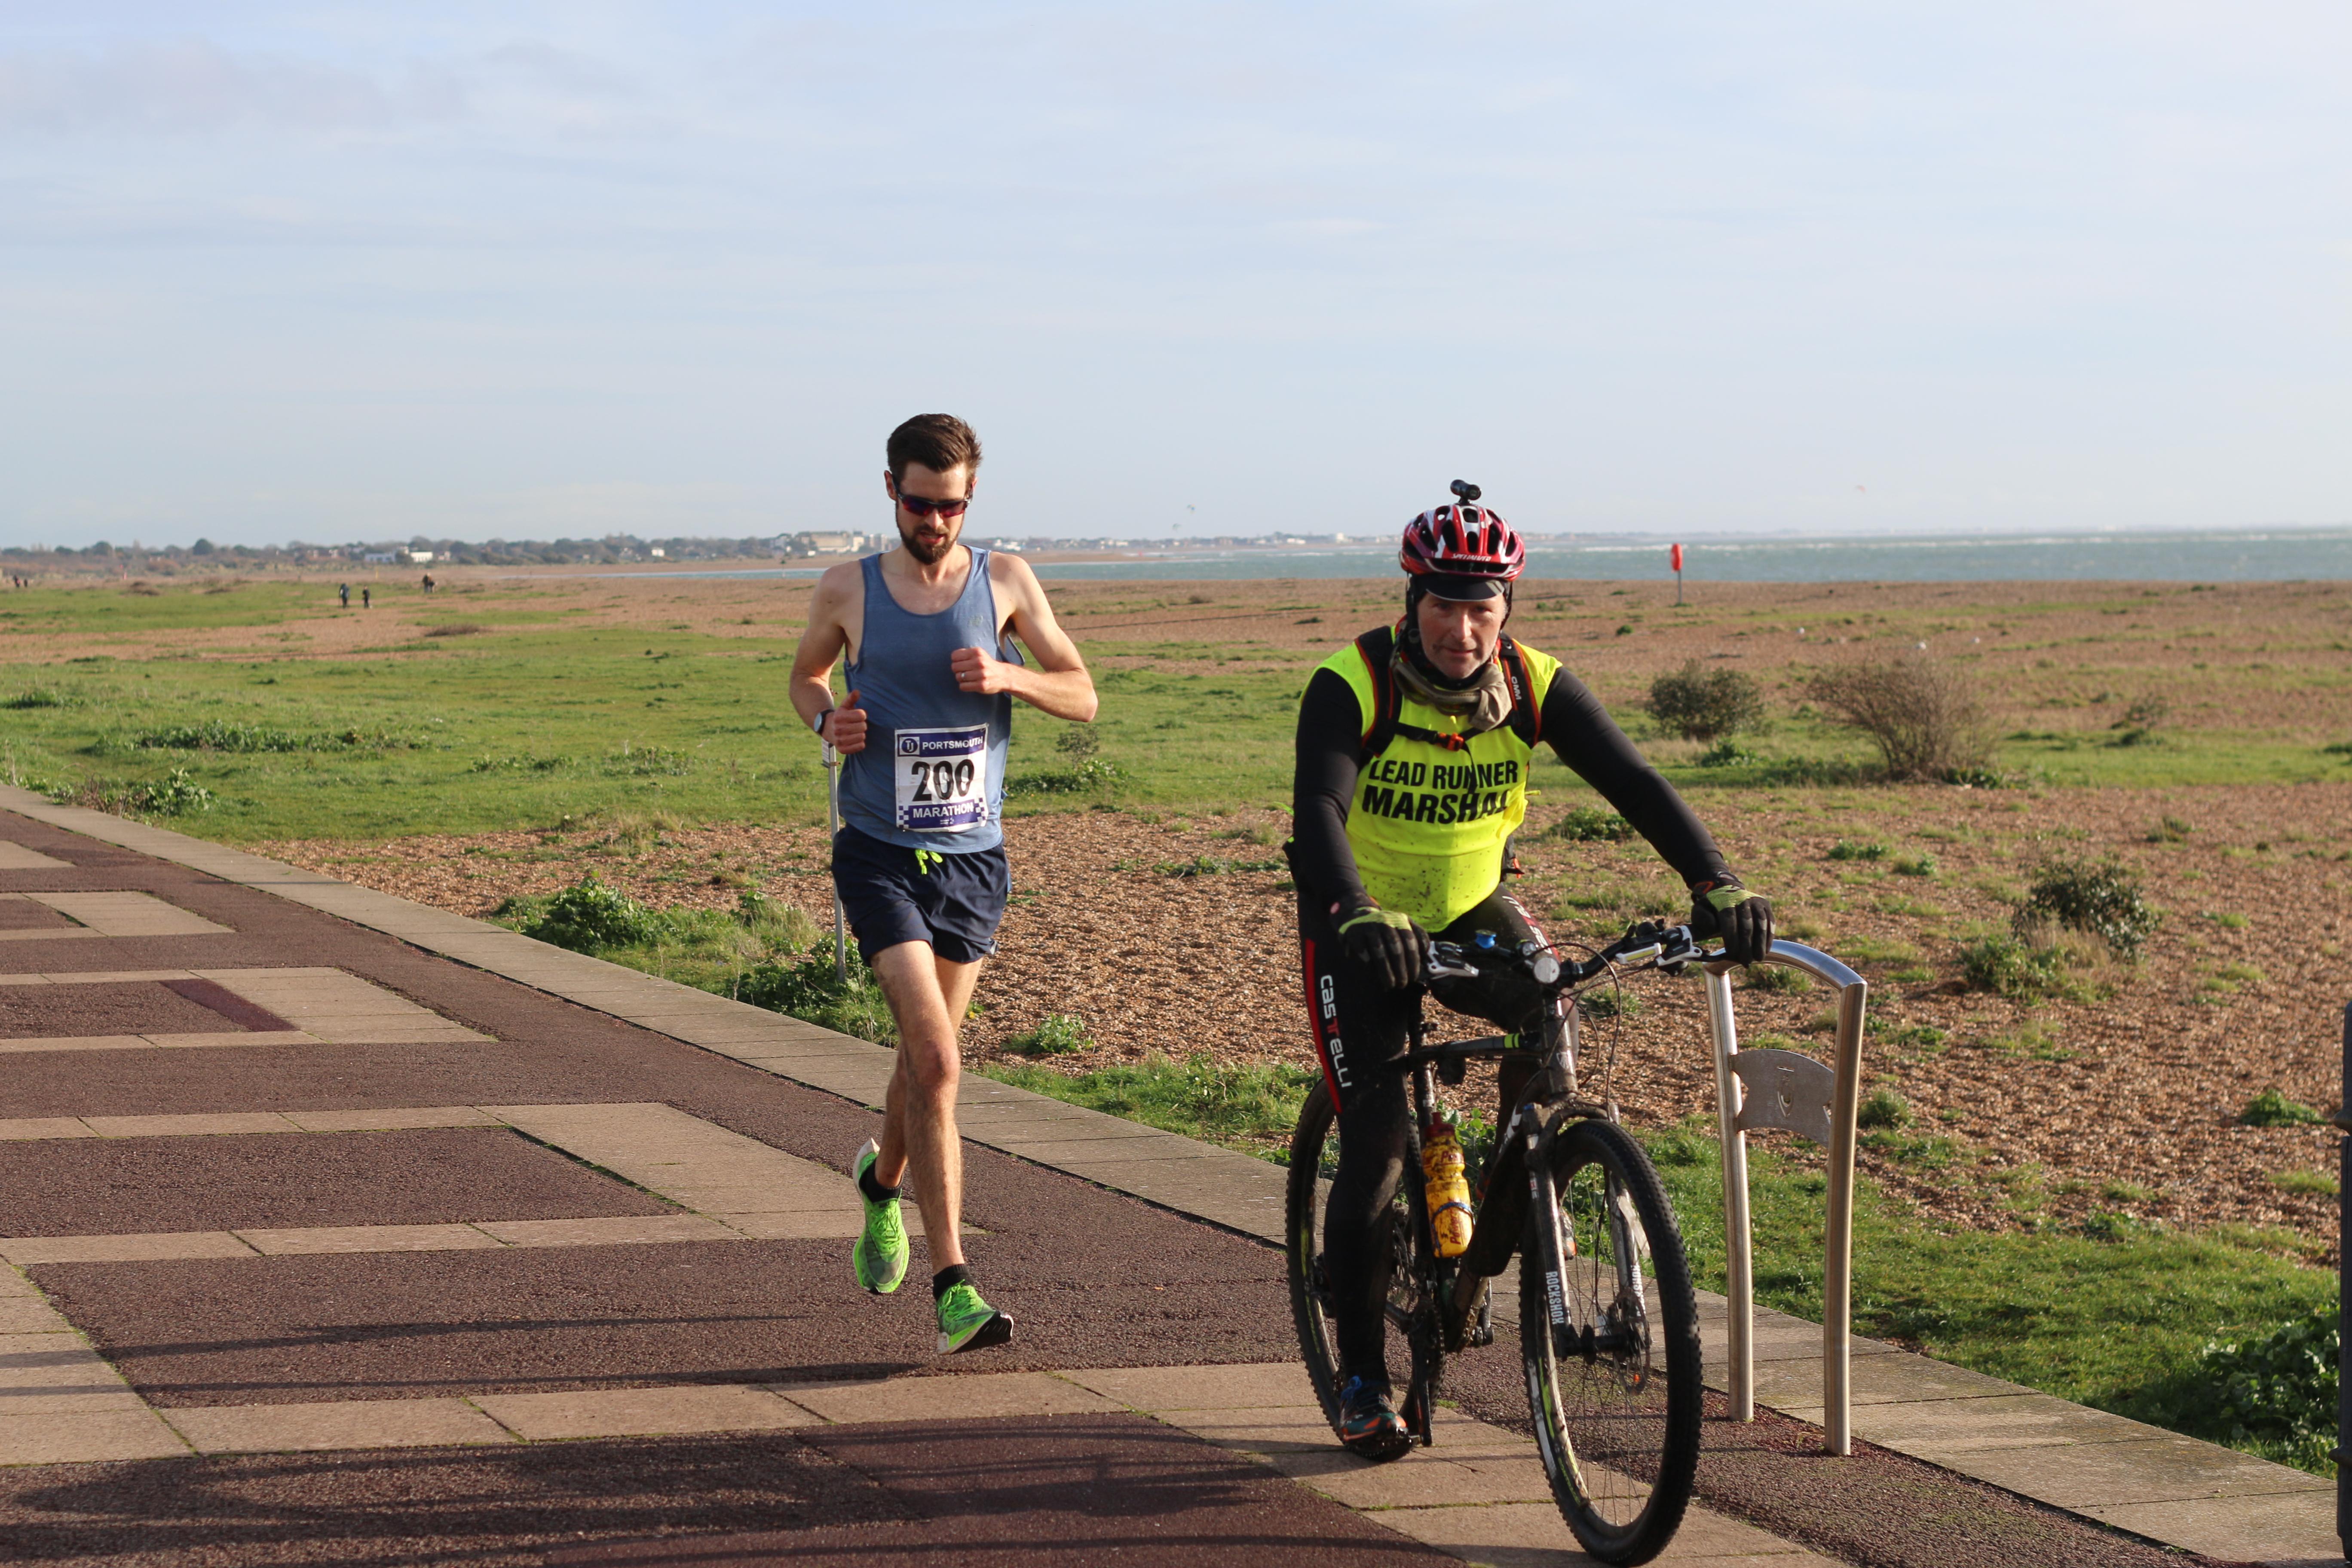 Pete Concannon leading the Portsmouth Coastal Marathon